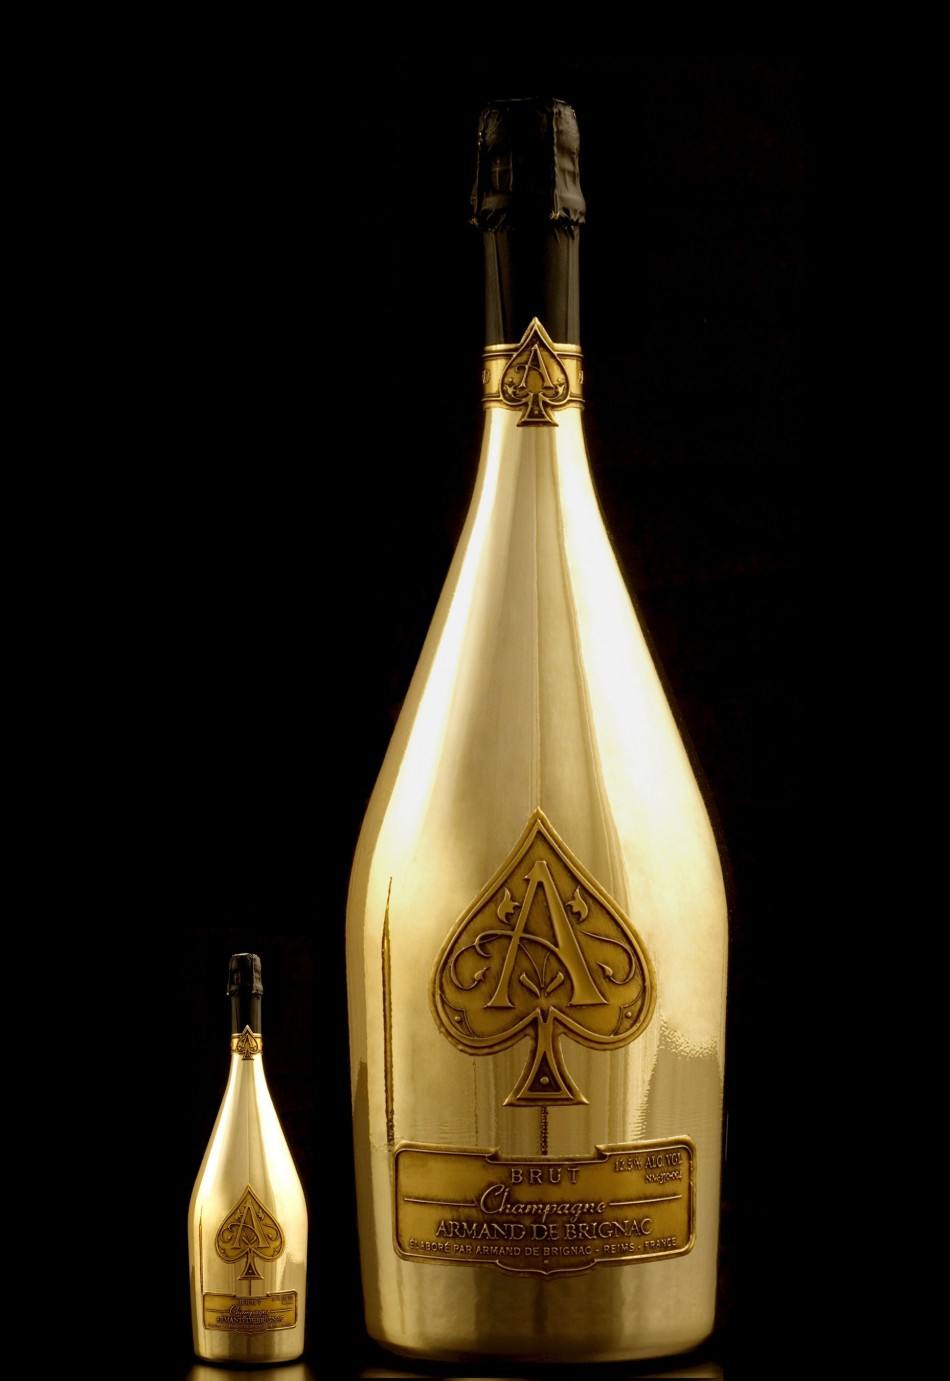 Midas: World's largest luxury champagne bottle.